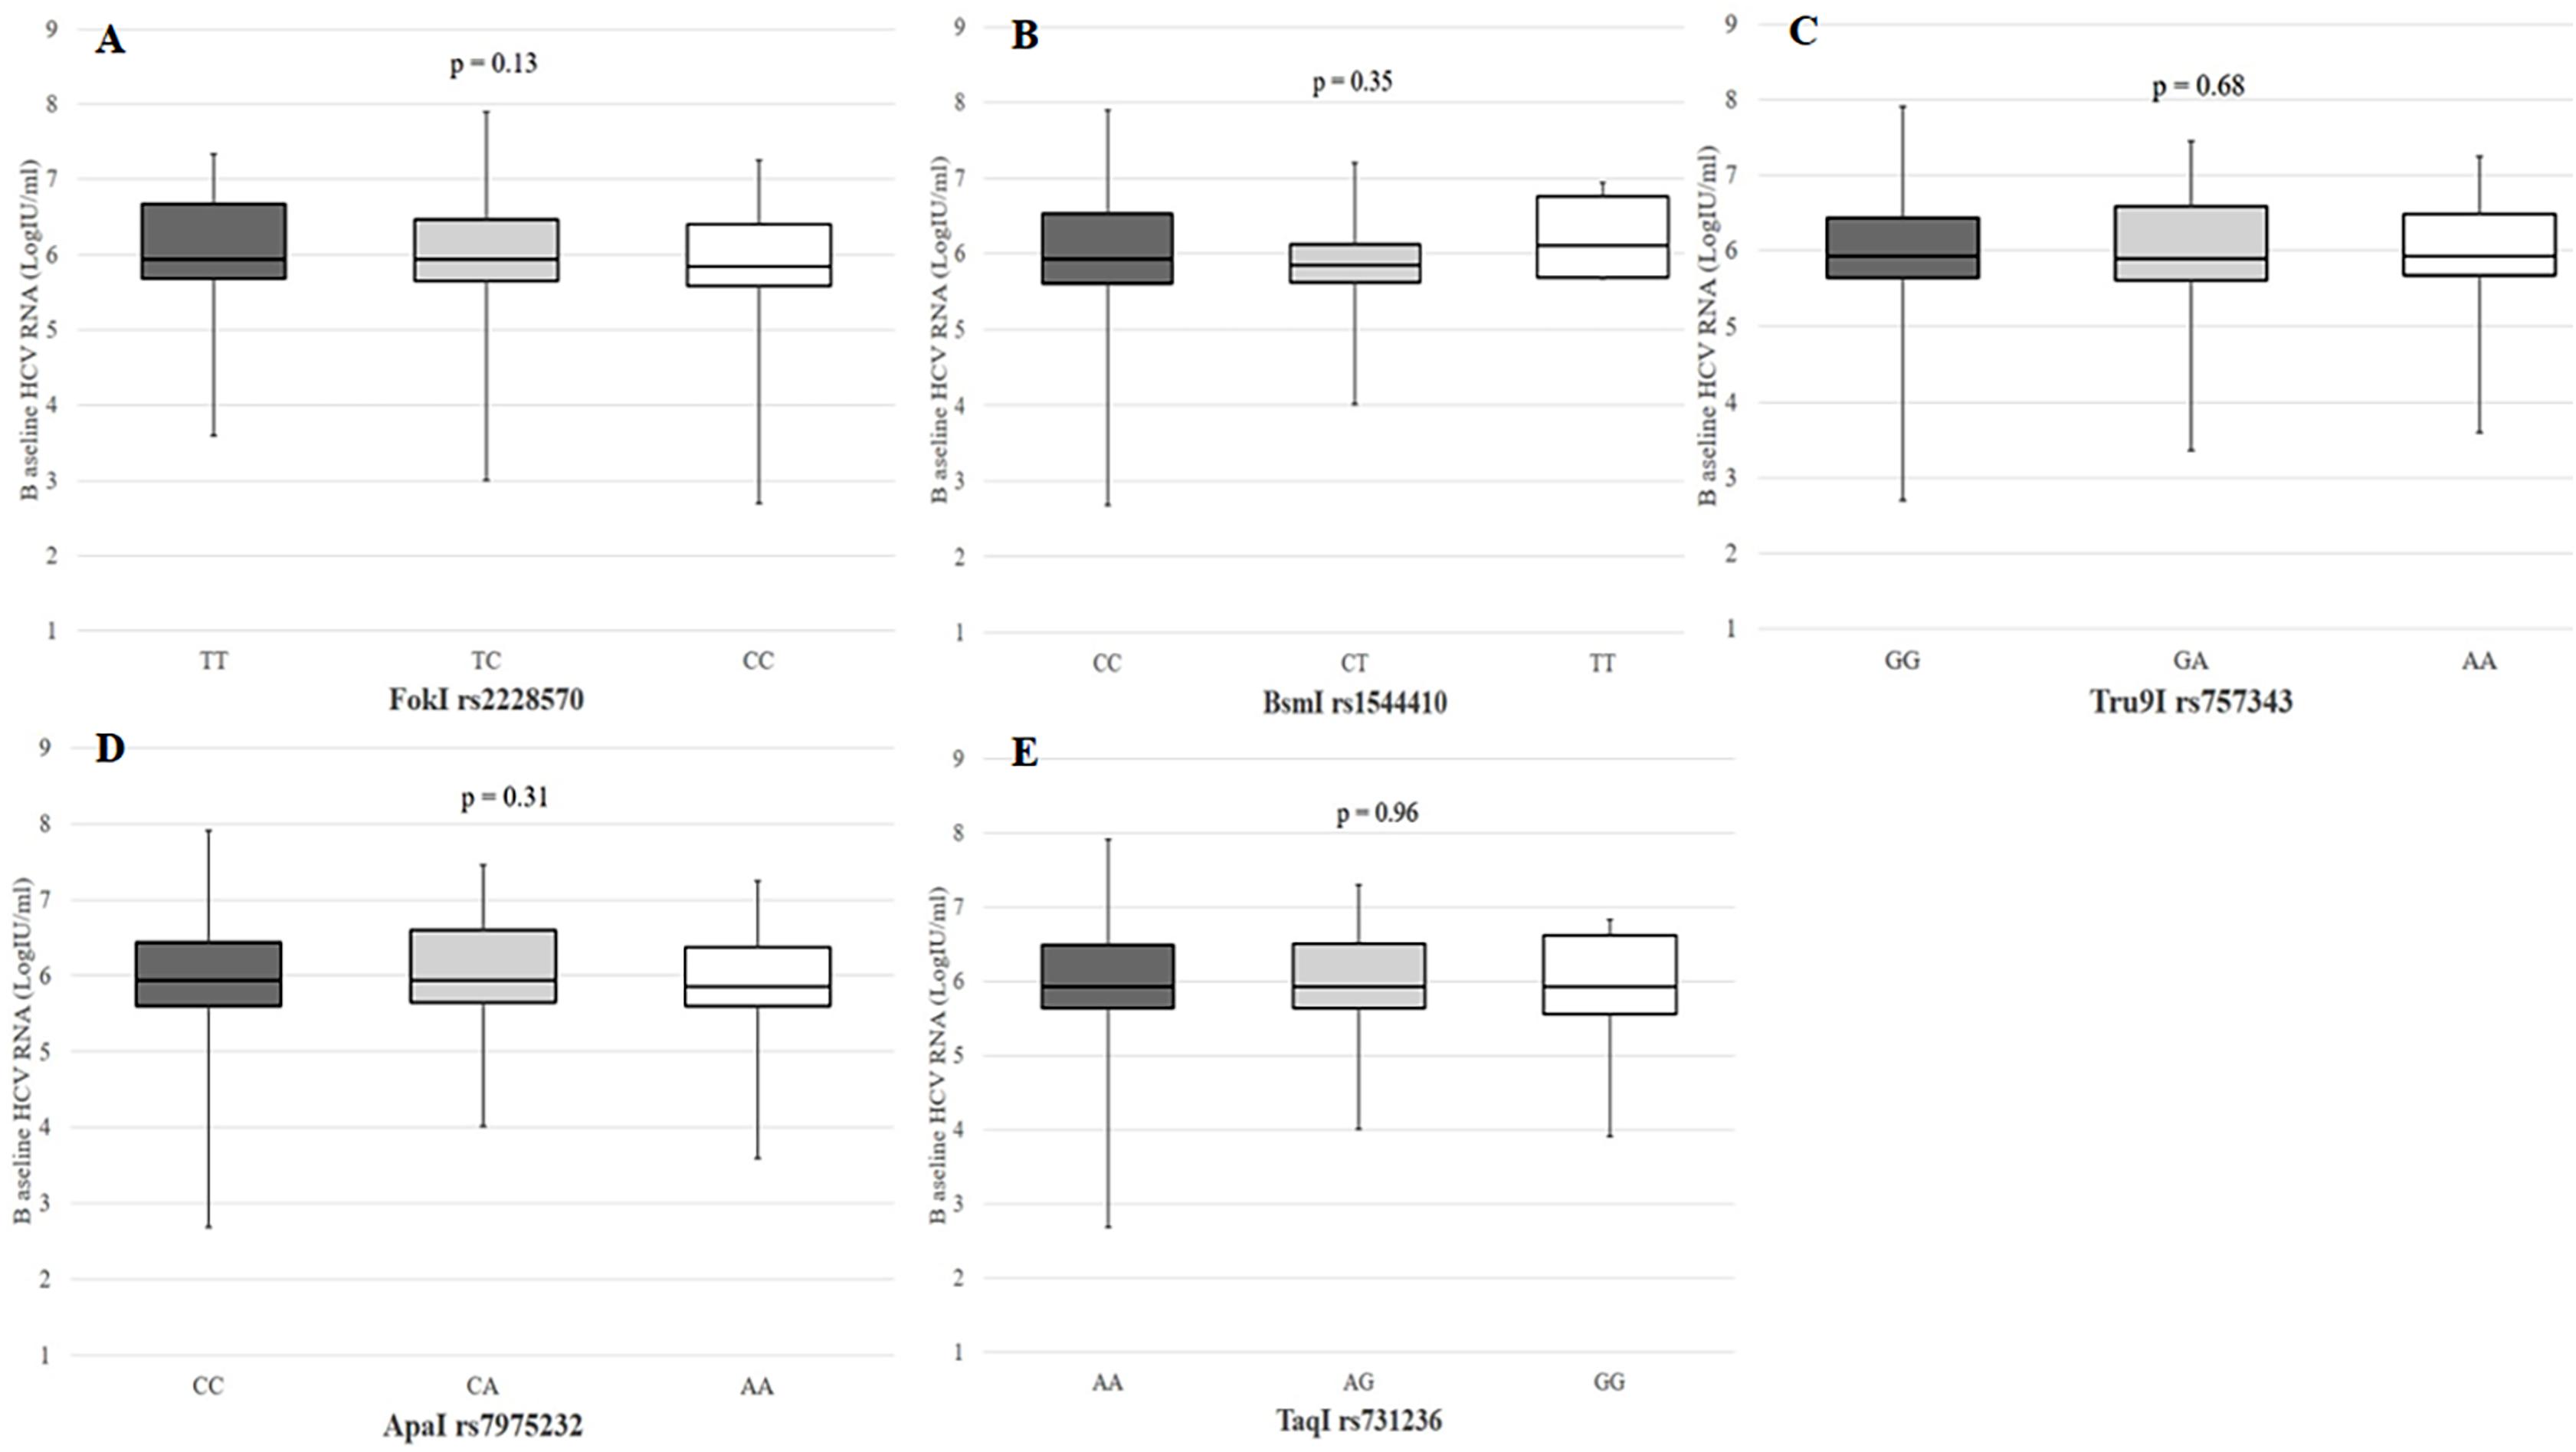 Genetic associations of vitamin D receptor polymorphisms